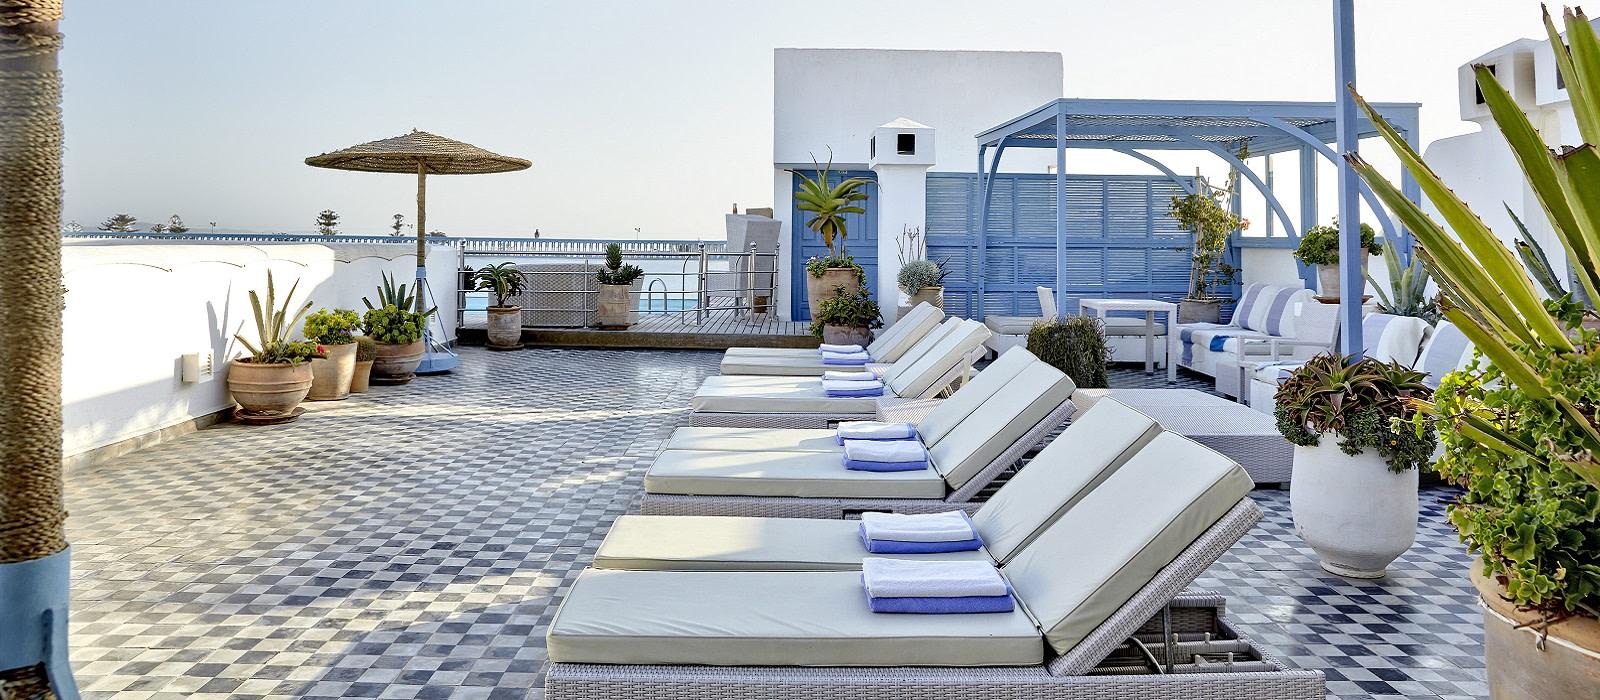 Hotel Heure Bleue Palais Marokko